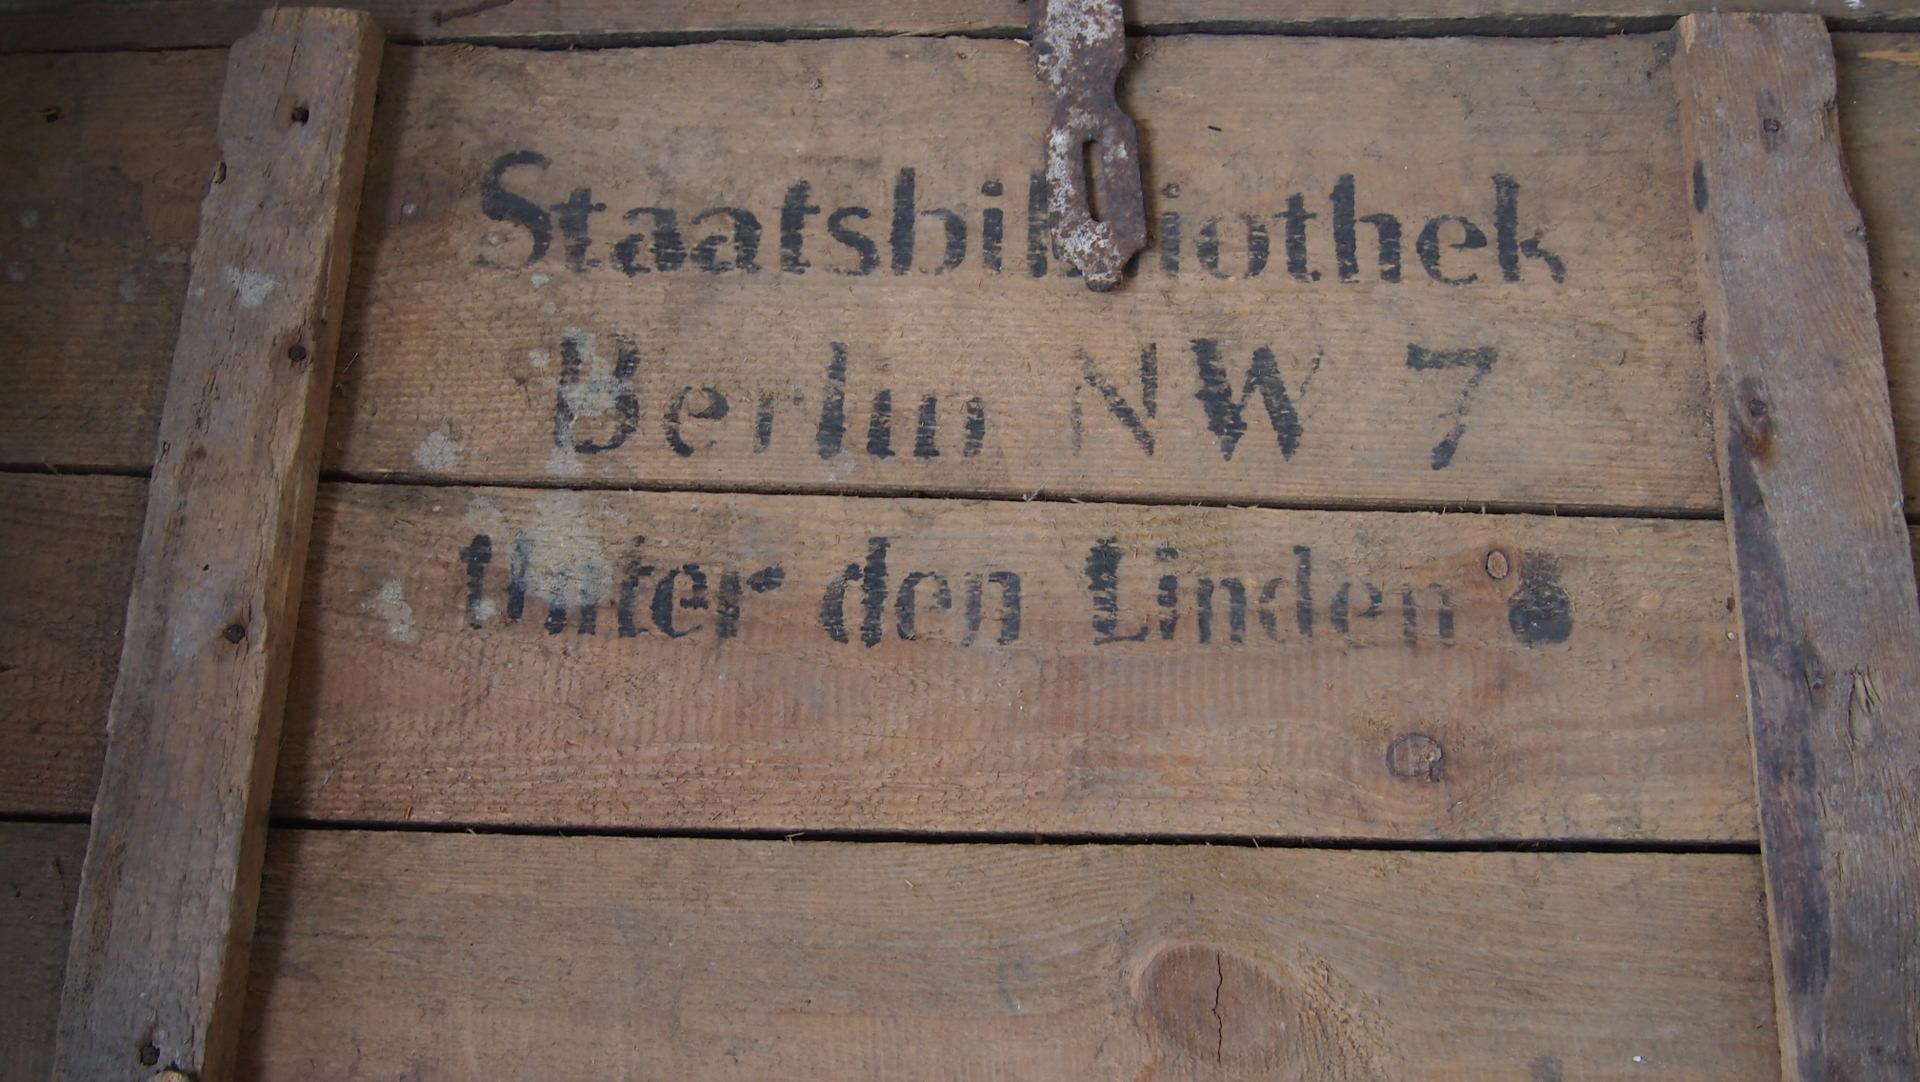 505 misteries prussian treasure in Krakow